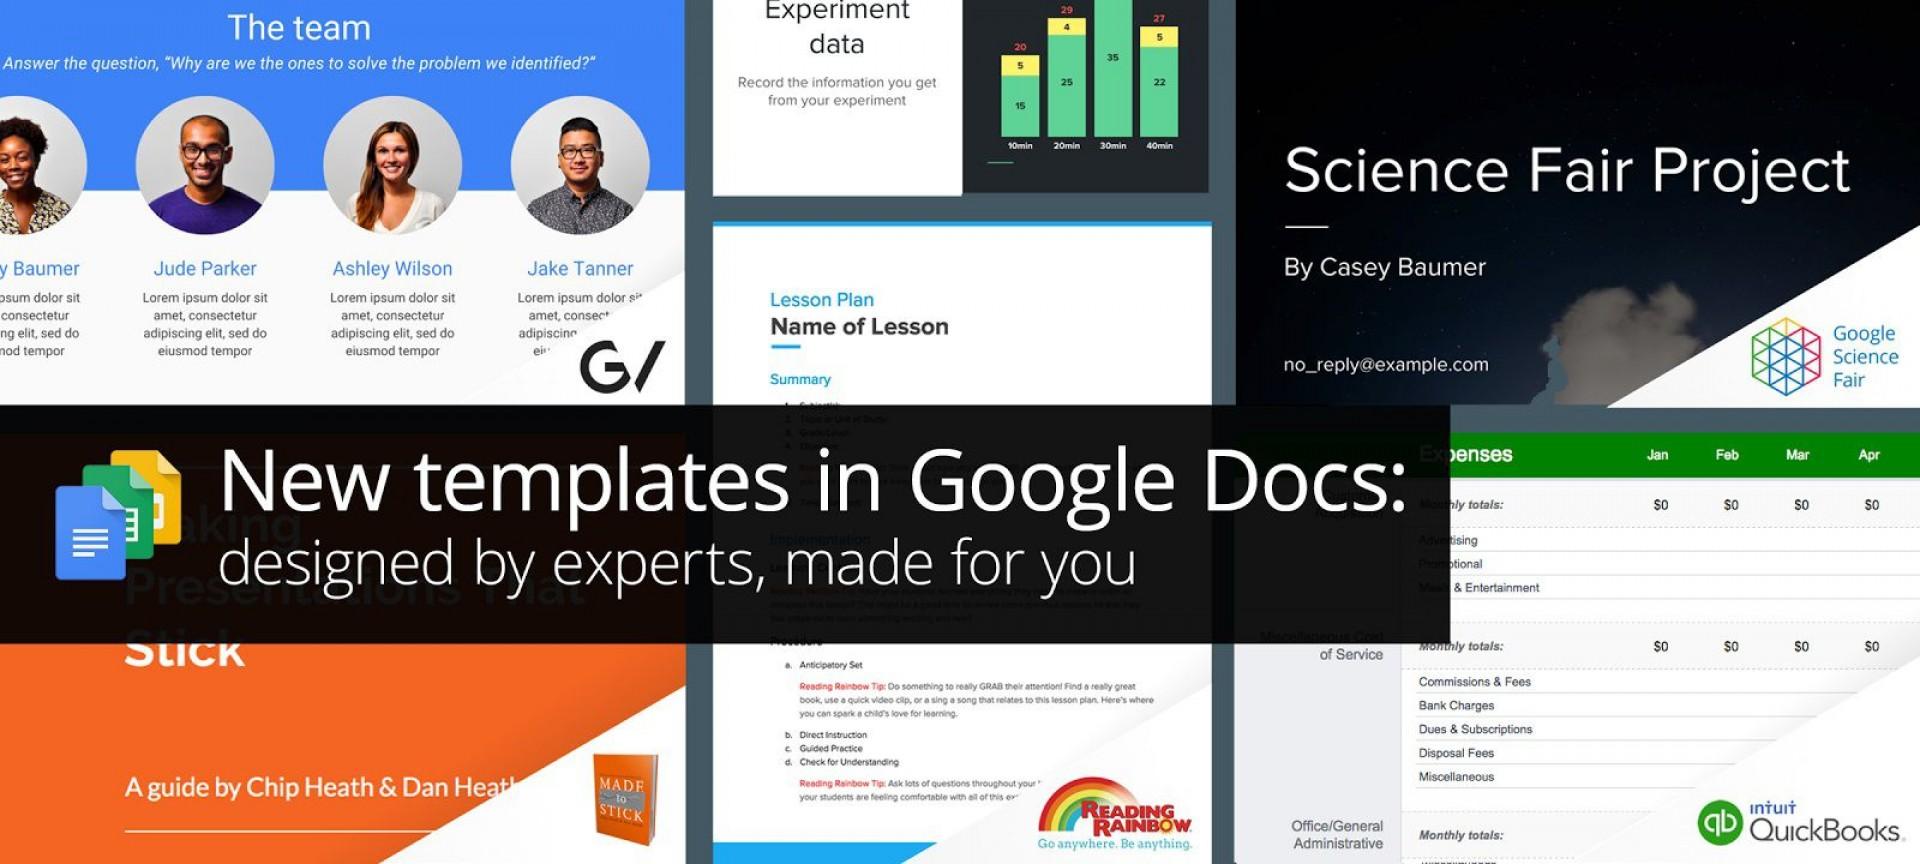 001 Stupendou Free Google Doc Template Image  Templates Drive Slide For Teacher Report1920